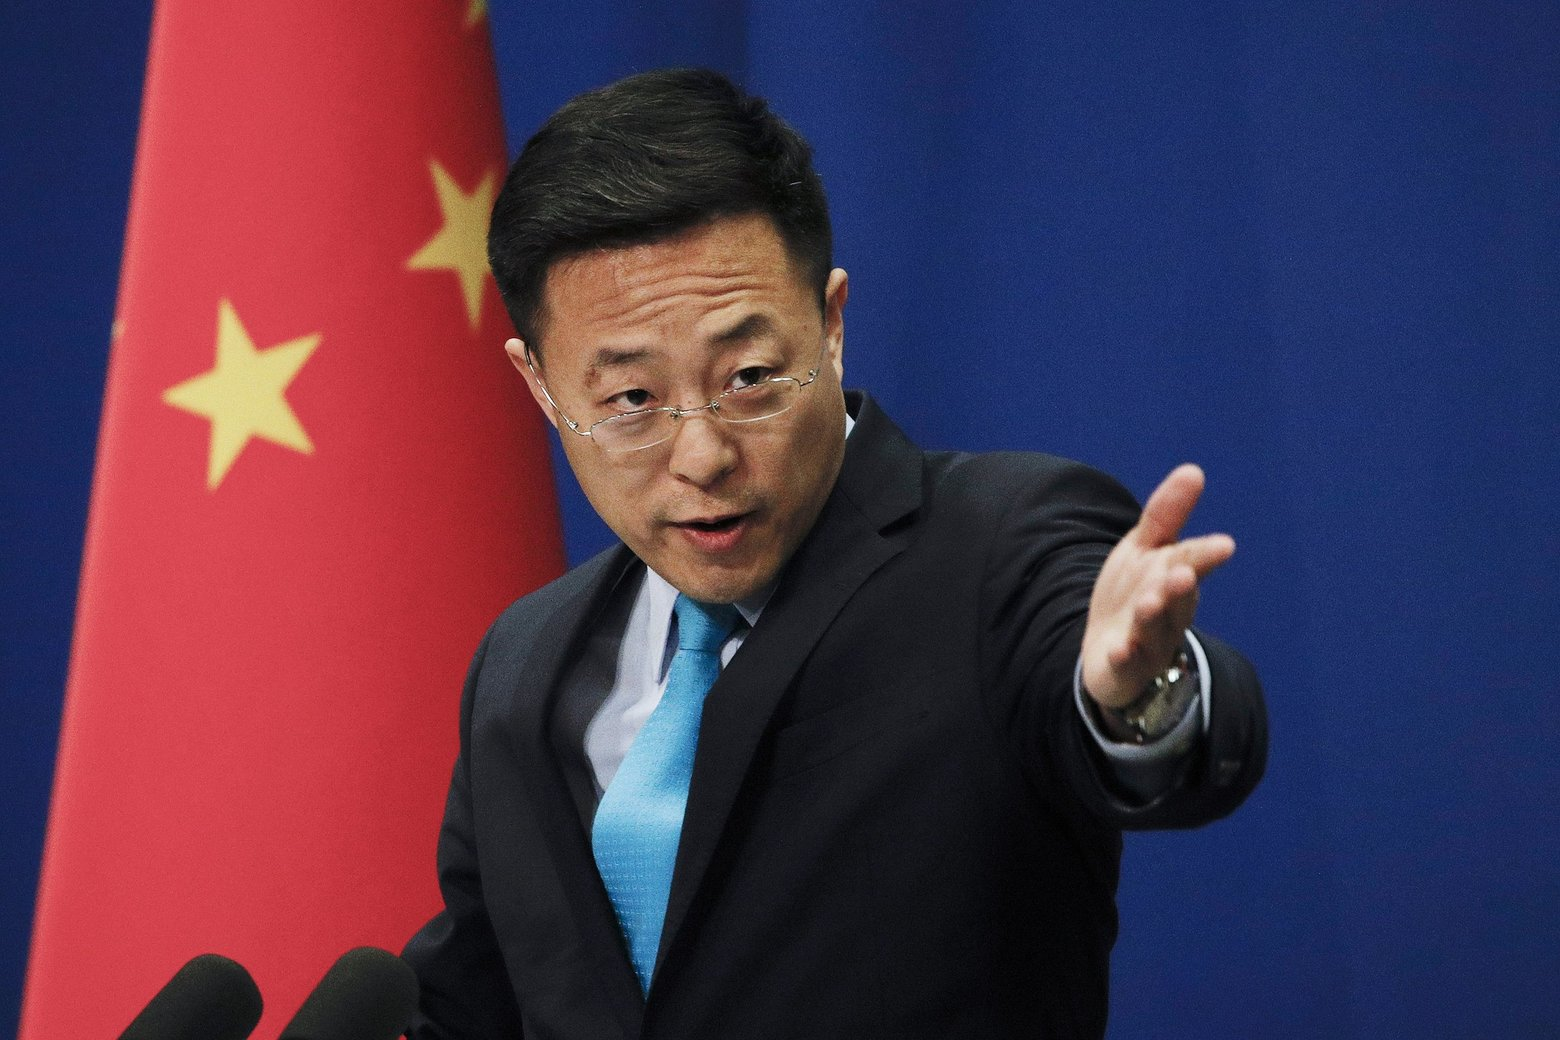 Portparol Ministarstva spoljnih poslova Kine Džao Liđijan (Foto: Andy Wong/The Associated Press)